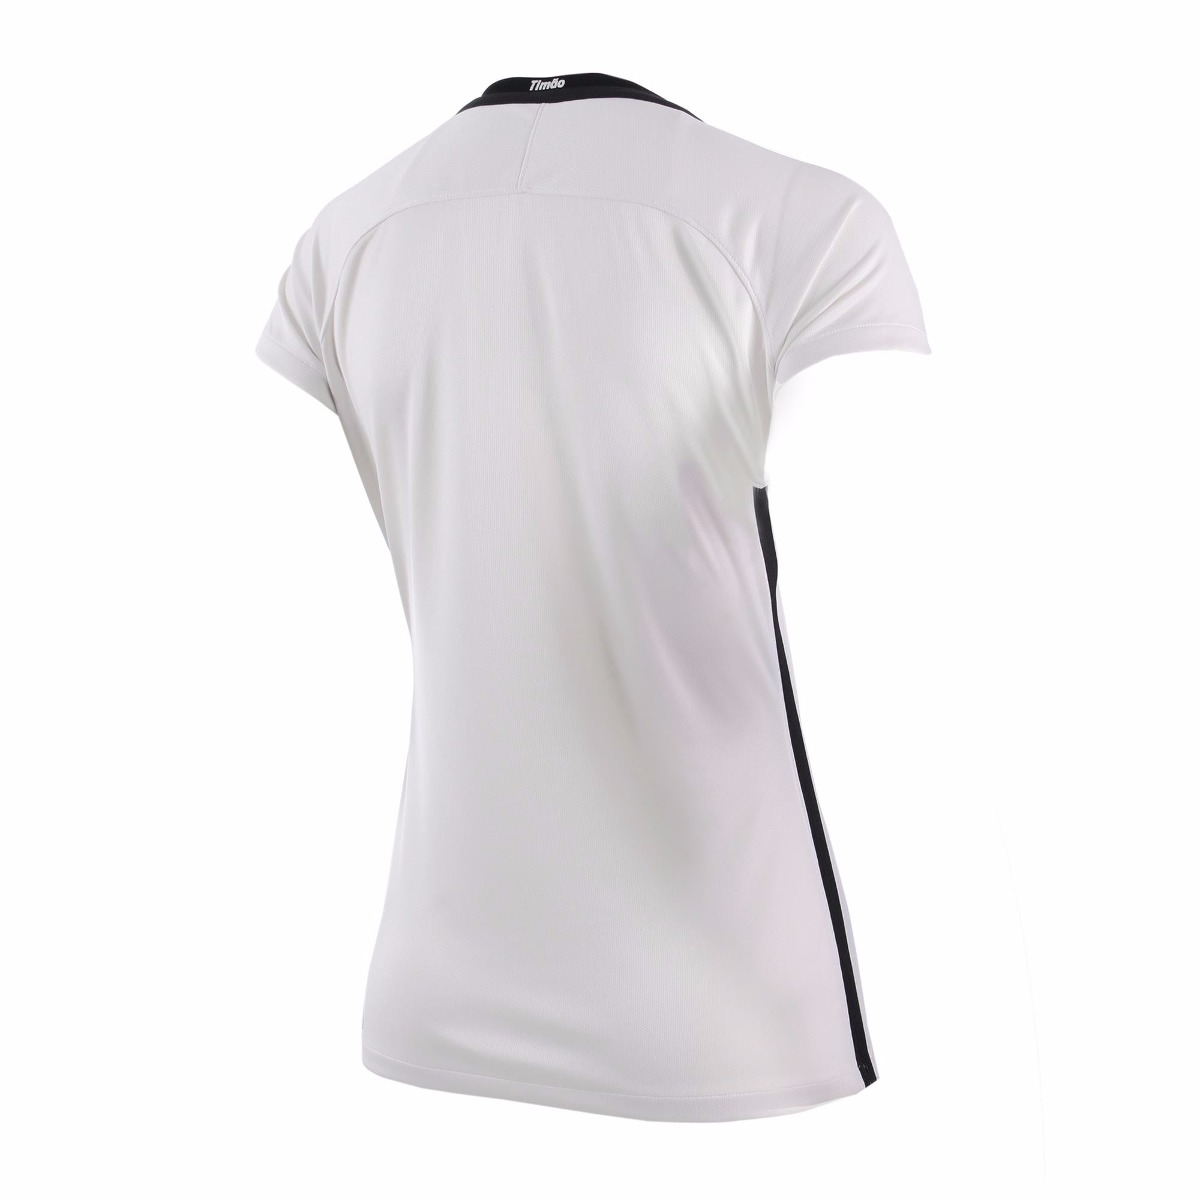 camisa corinthians nike feminina 2016 17 - original. Carregando zoom... camisa  corinthians feminina. Carregando zoom. 41a5d496f6bca